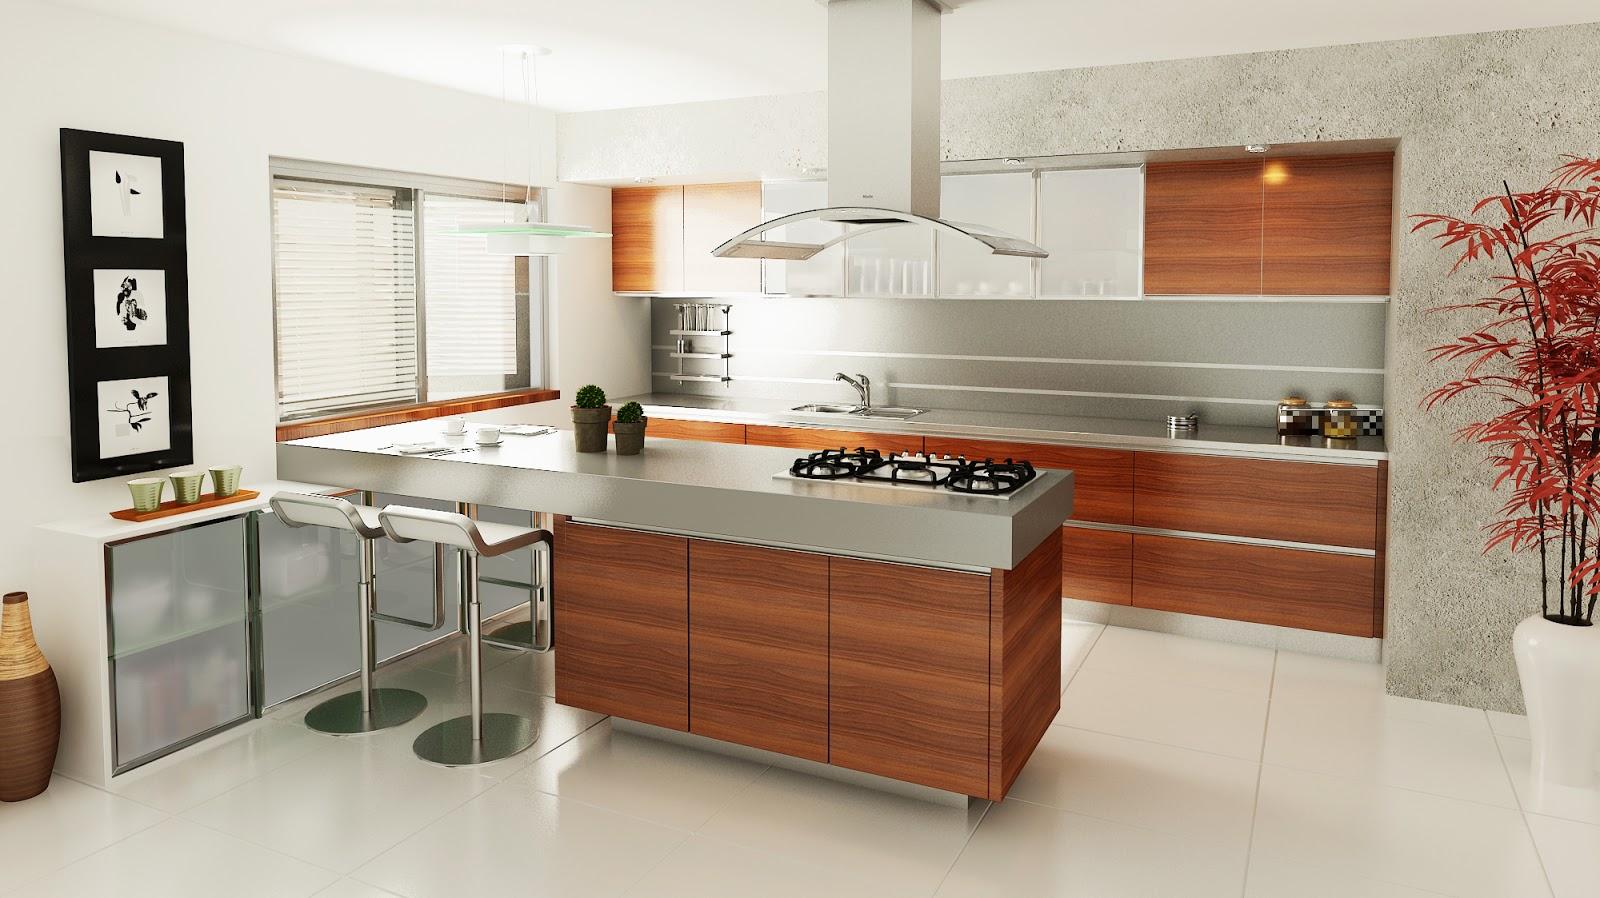 Arquitectura en im genes 3d dise o de interiores cocinas for Disenos de interiores de cocinas